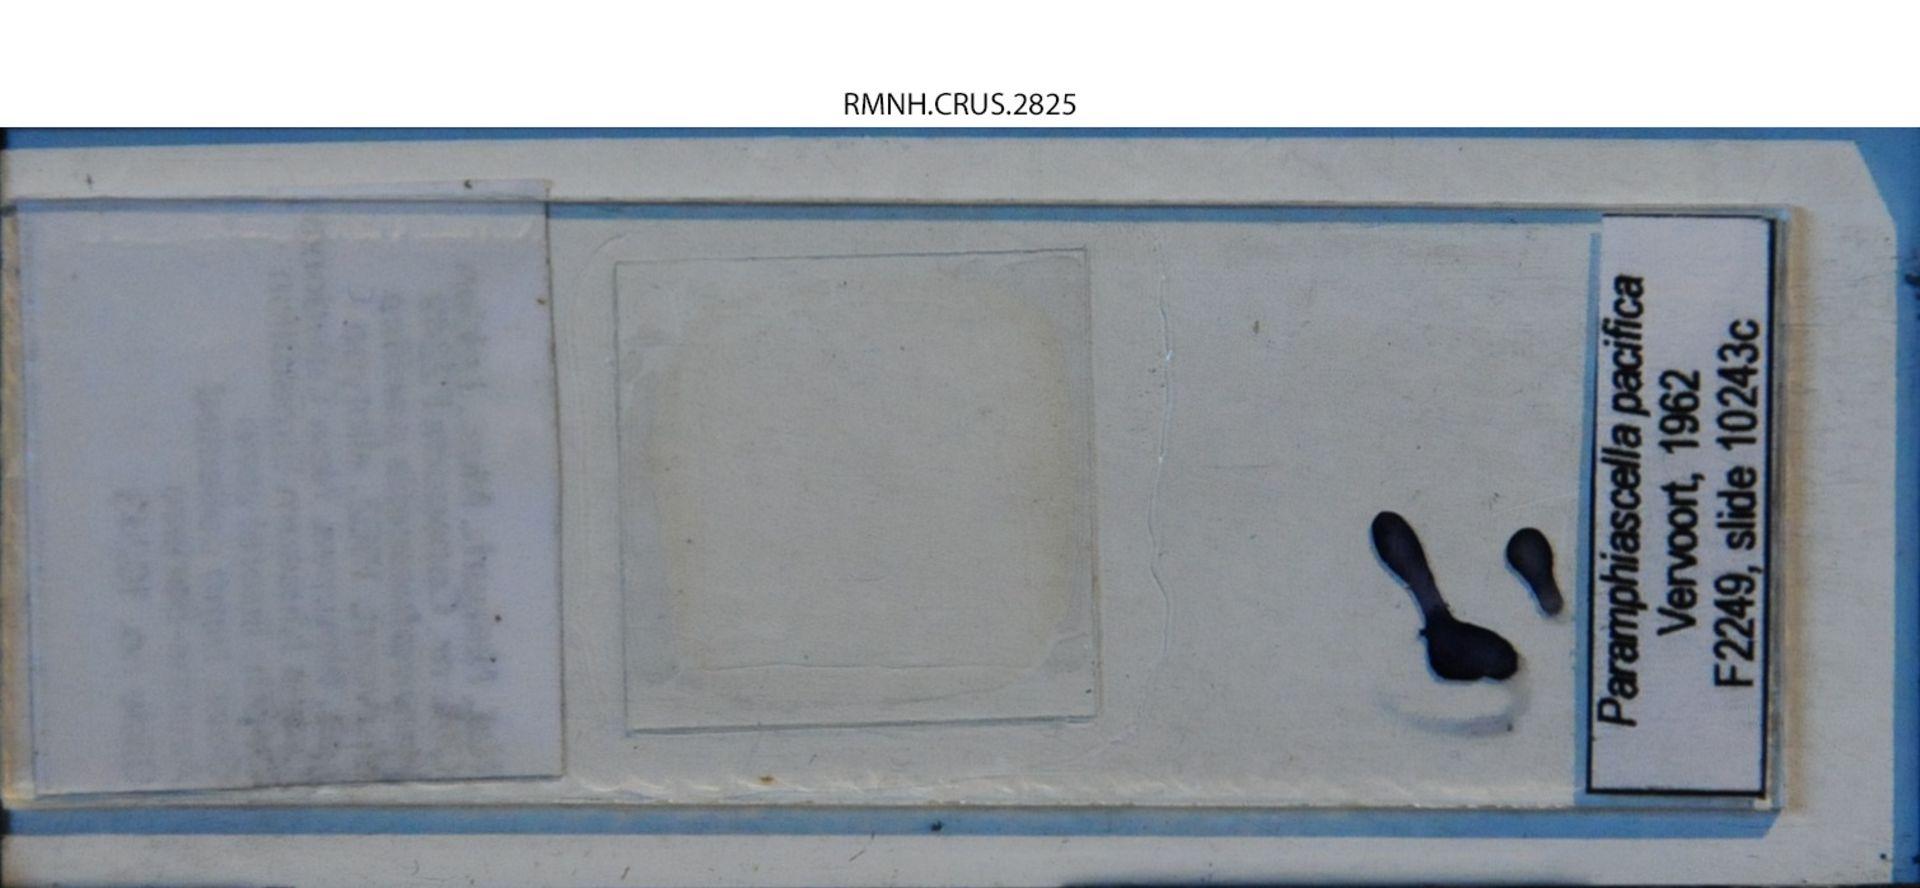 RMNH.CRUS.2825 | Paramphiascella pacifica Vervoort, 1962